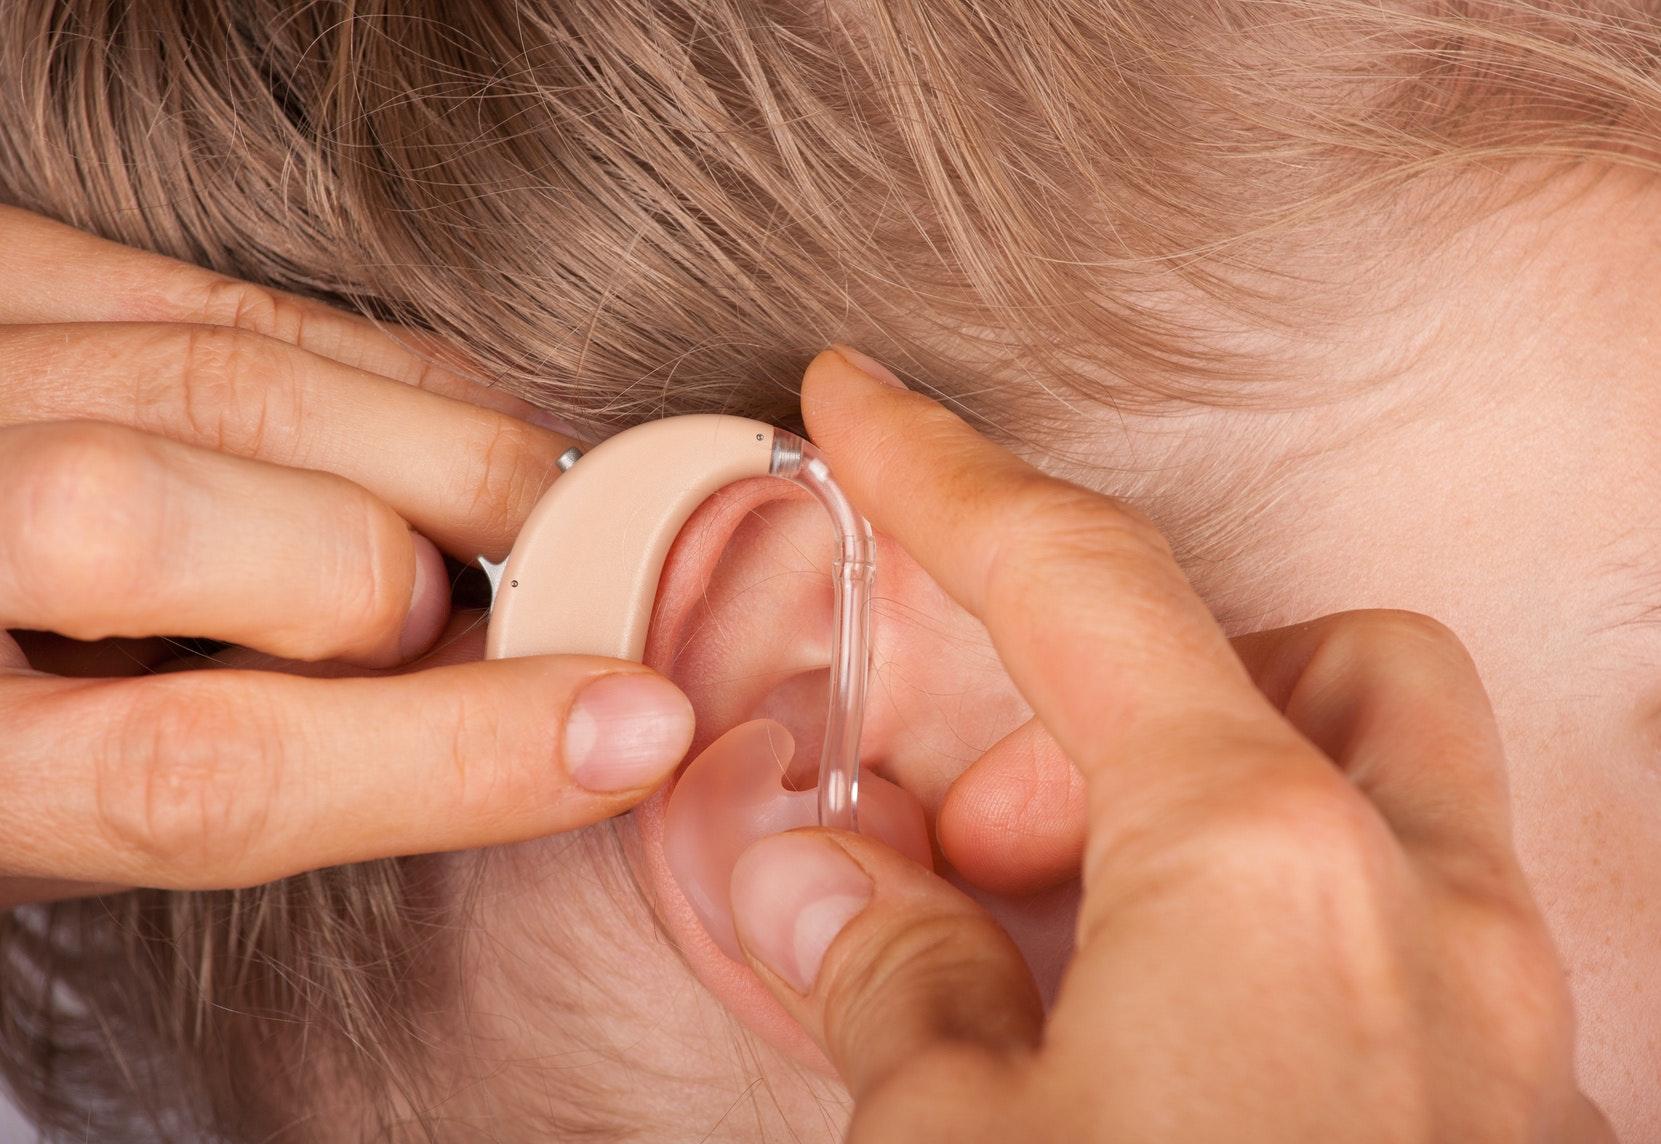 Enfants sourds ou malentendants